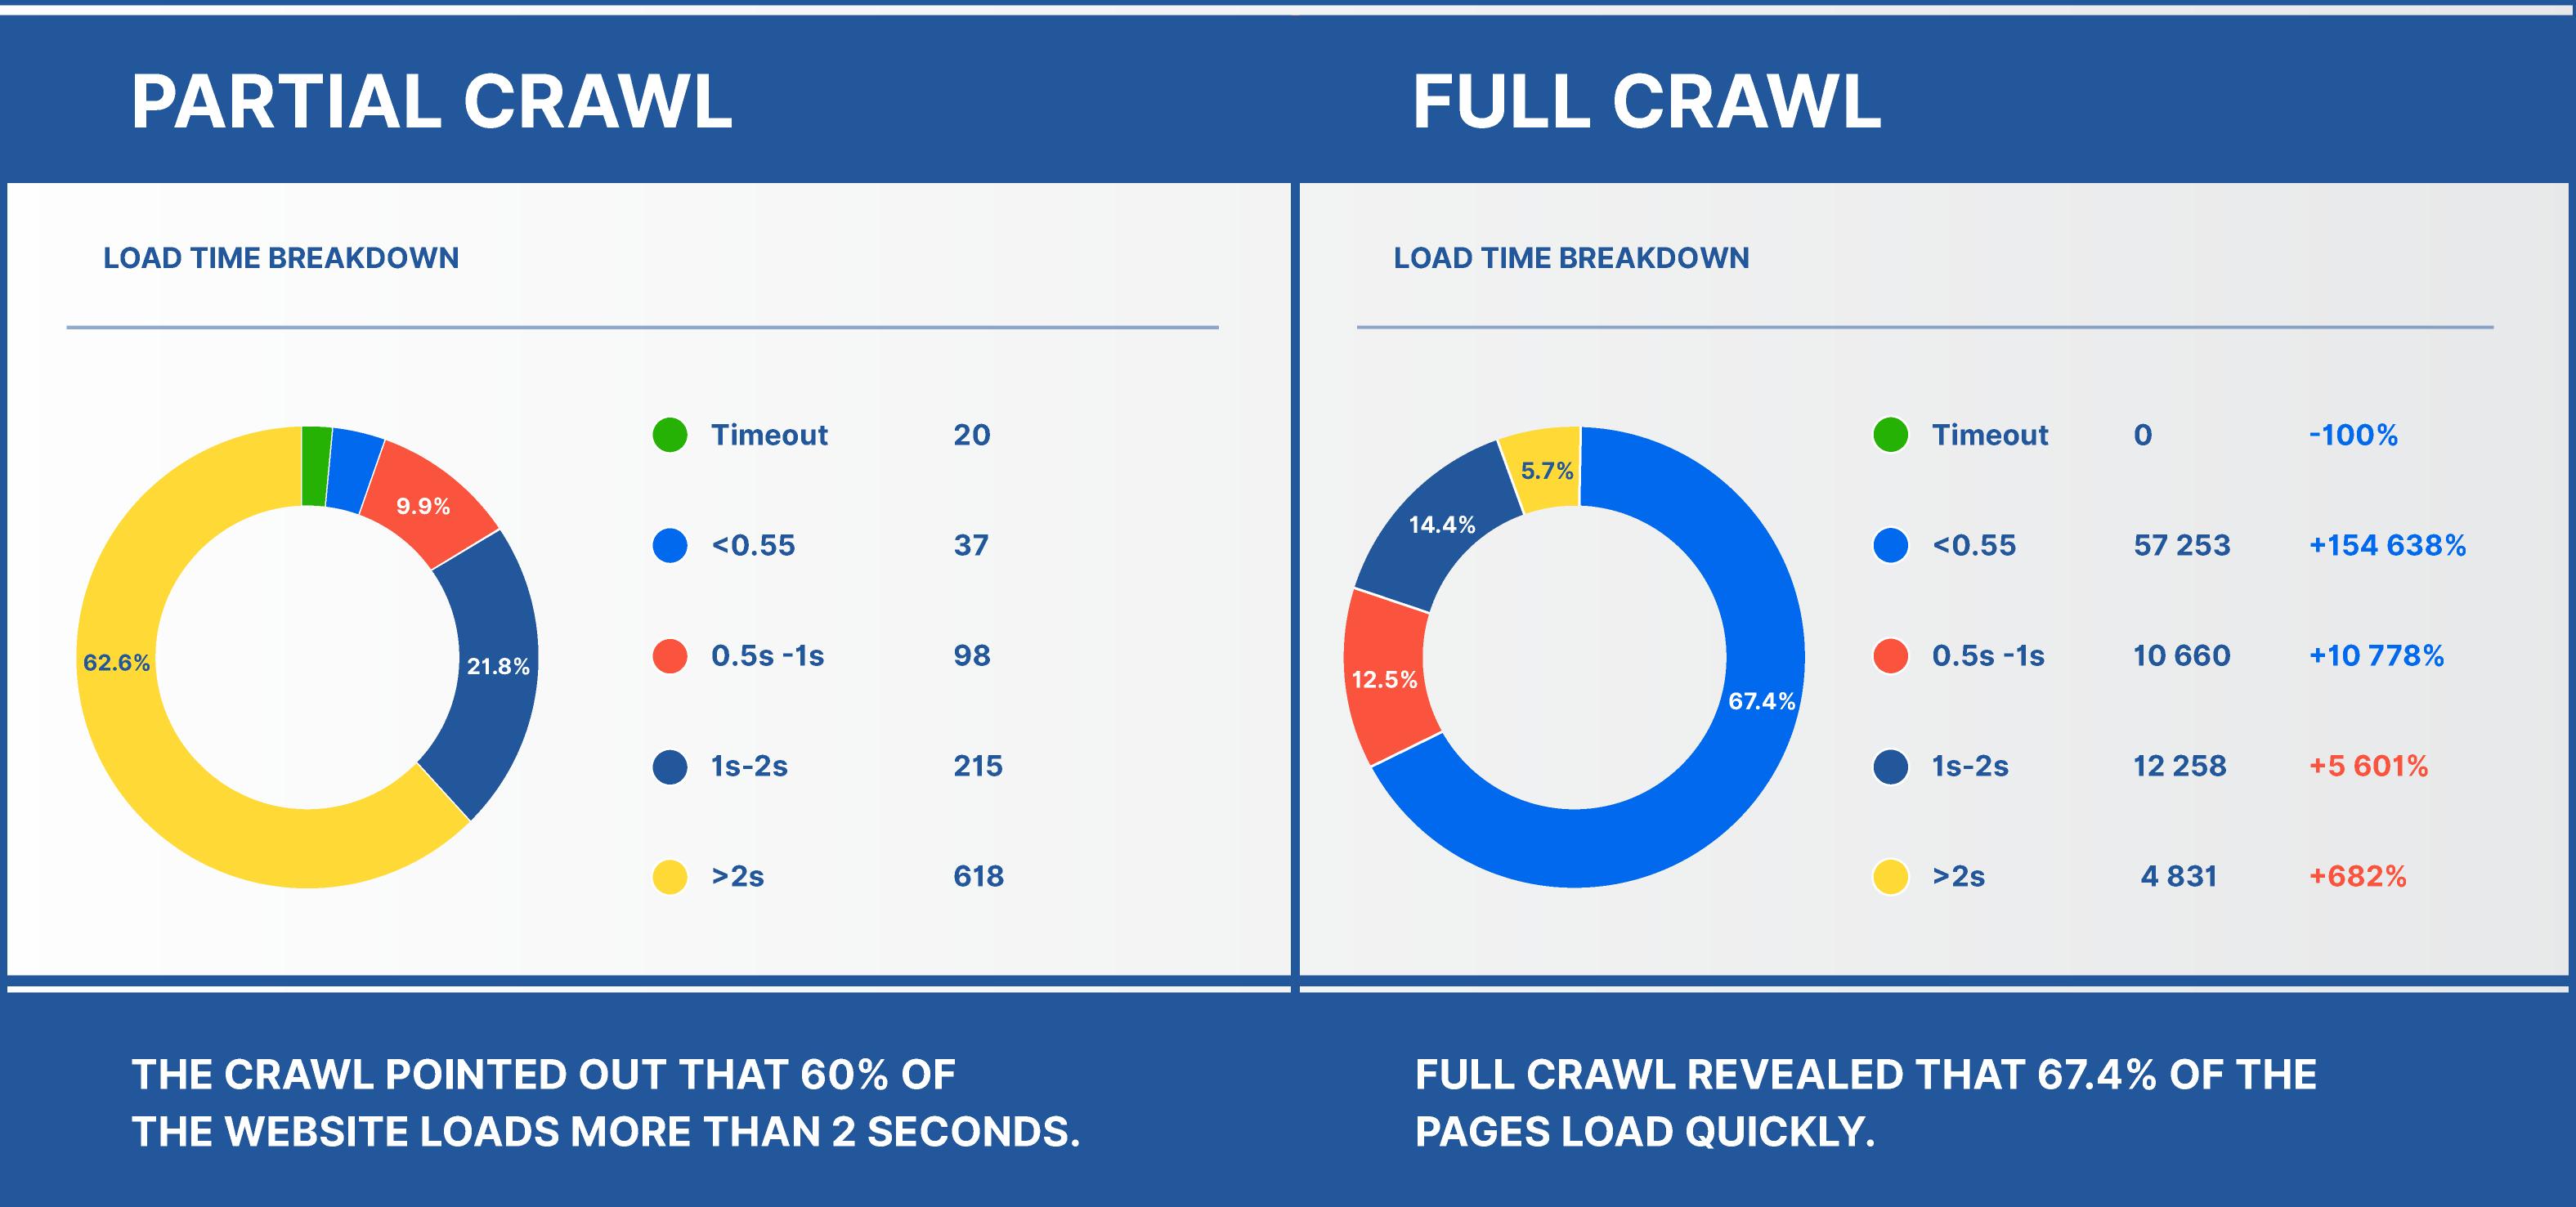 Partial Crawl vs Full Crawl